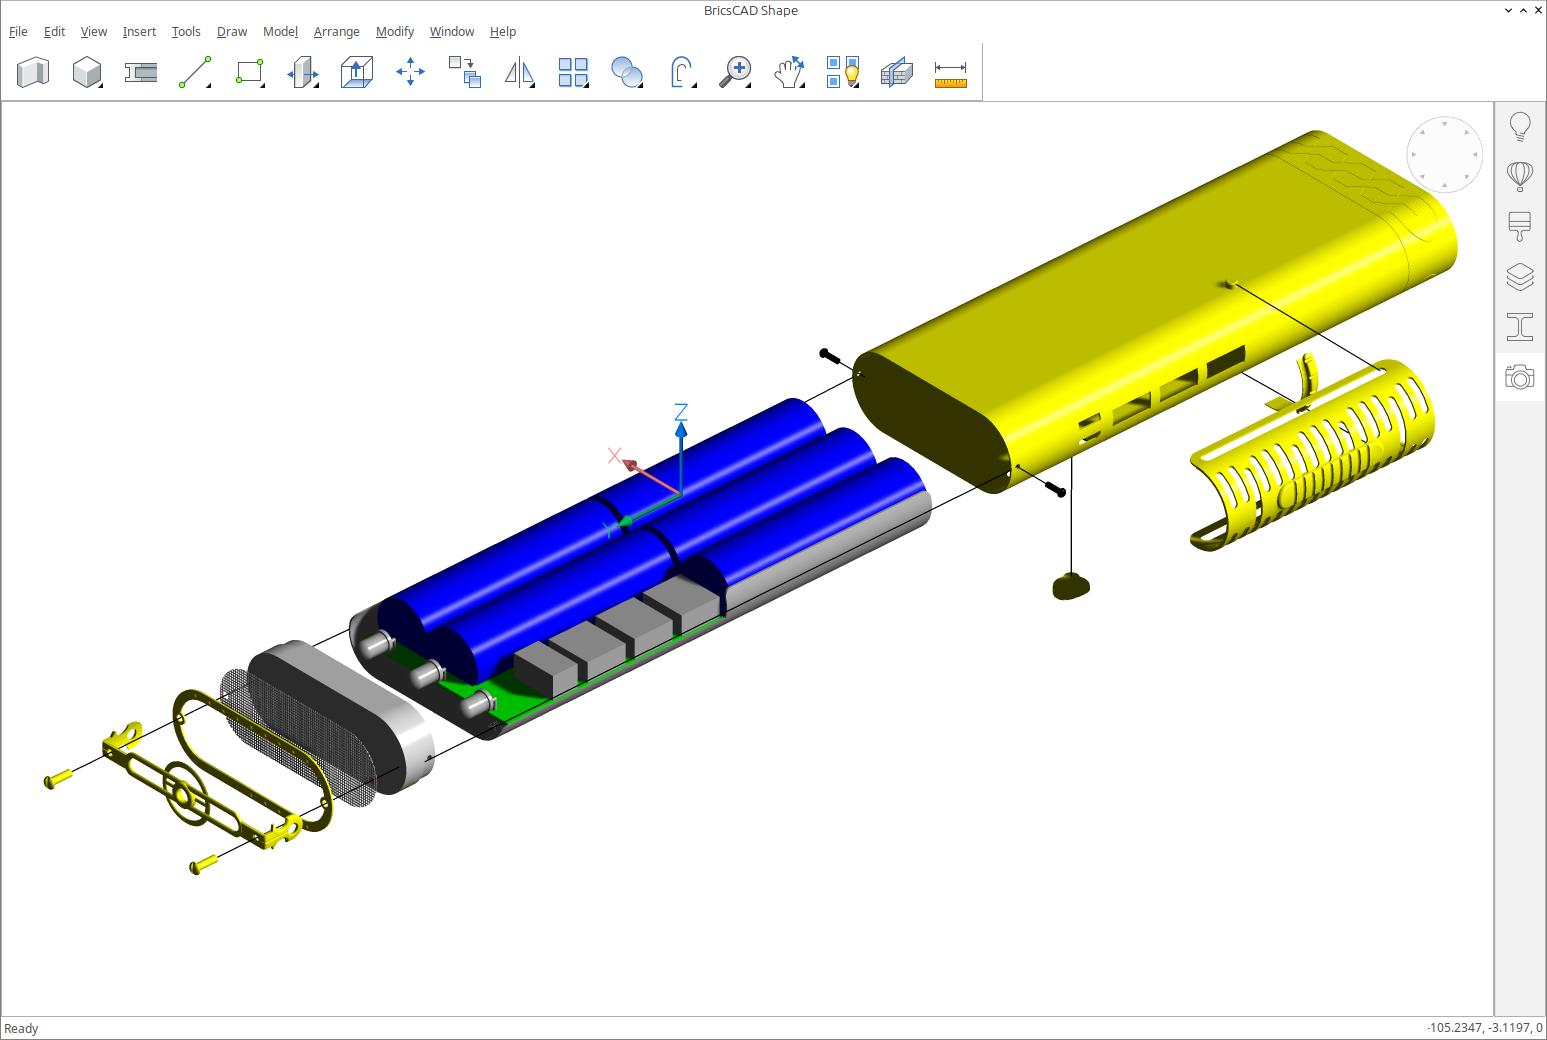 BricsCAD Shape — бесплатная 3D САПР от Bricsys - 1